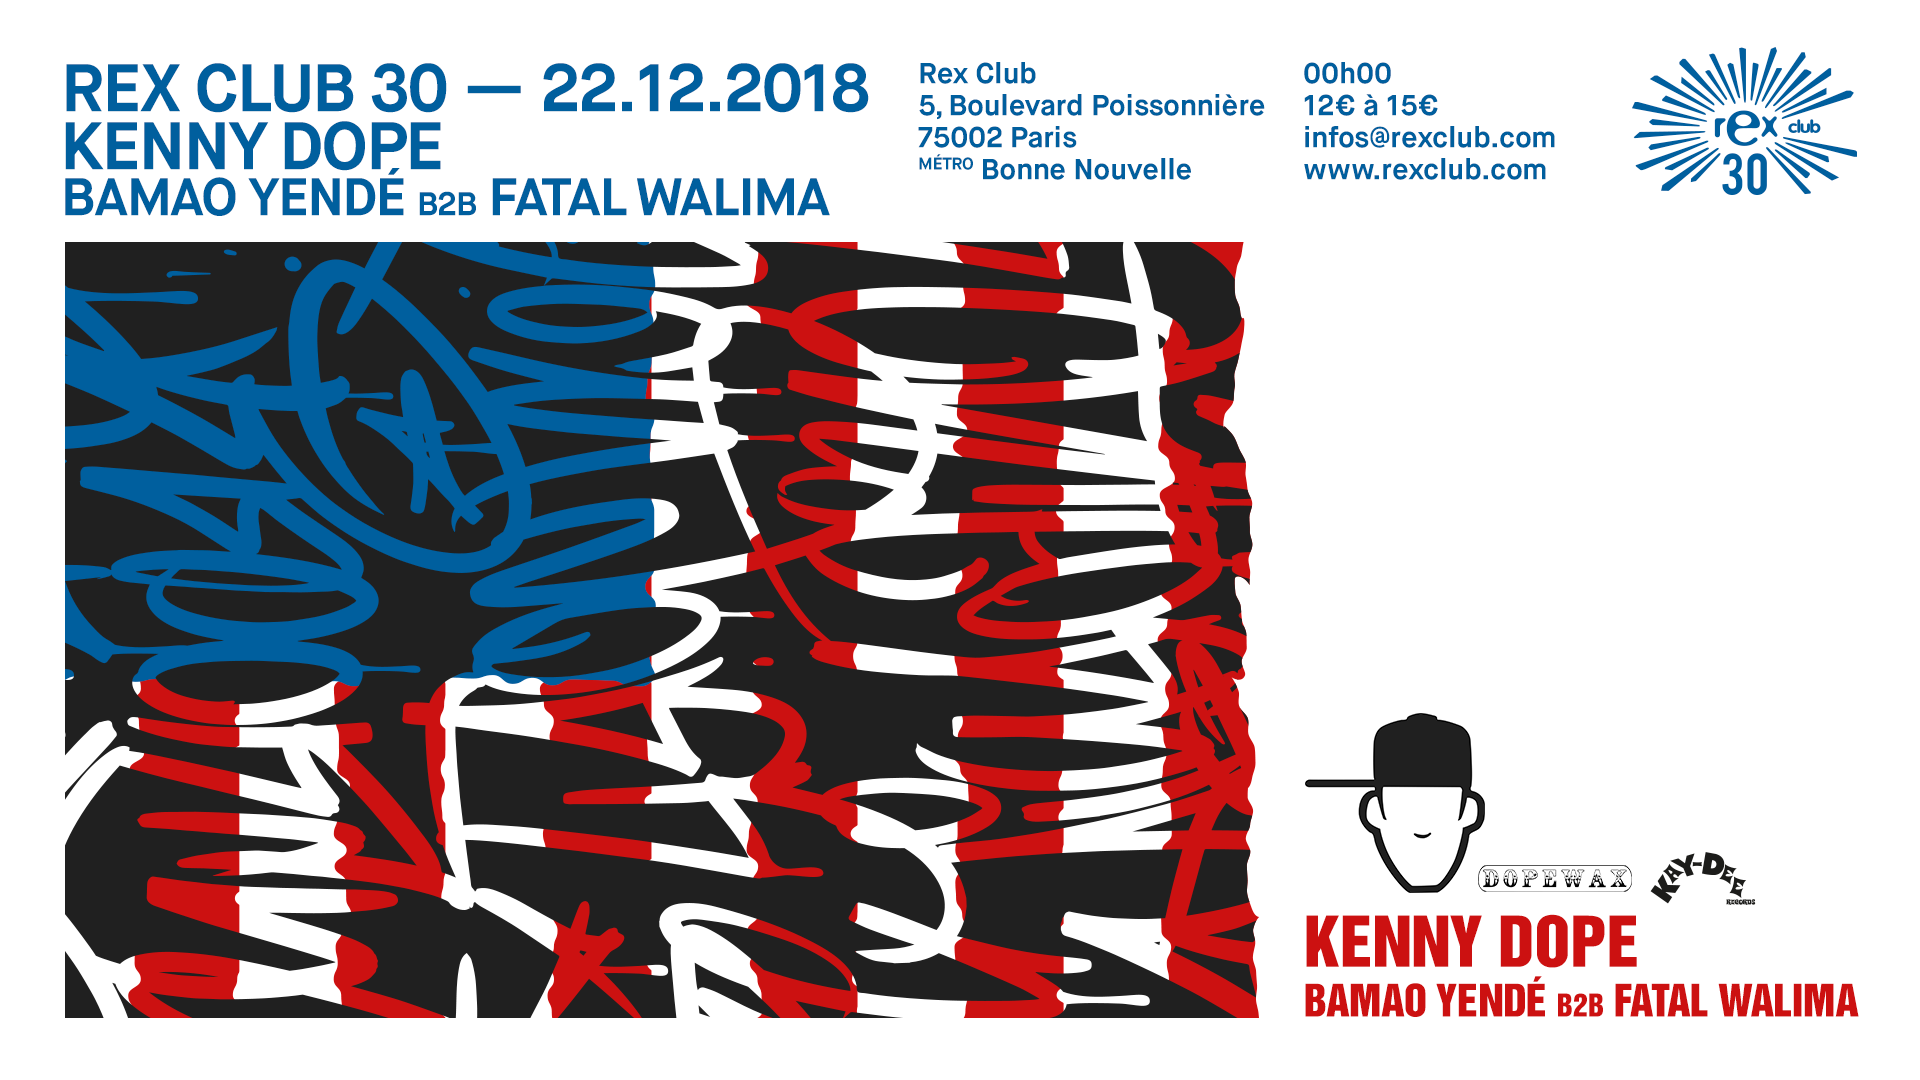 Rex Club 30 Présente: Kenny Dope, Bamao Yendé b2b Fatal Walima